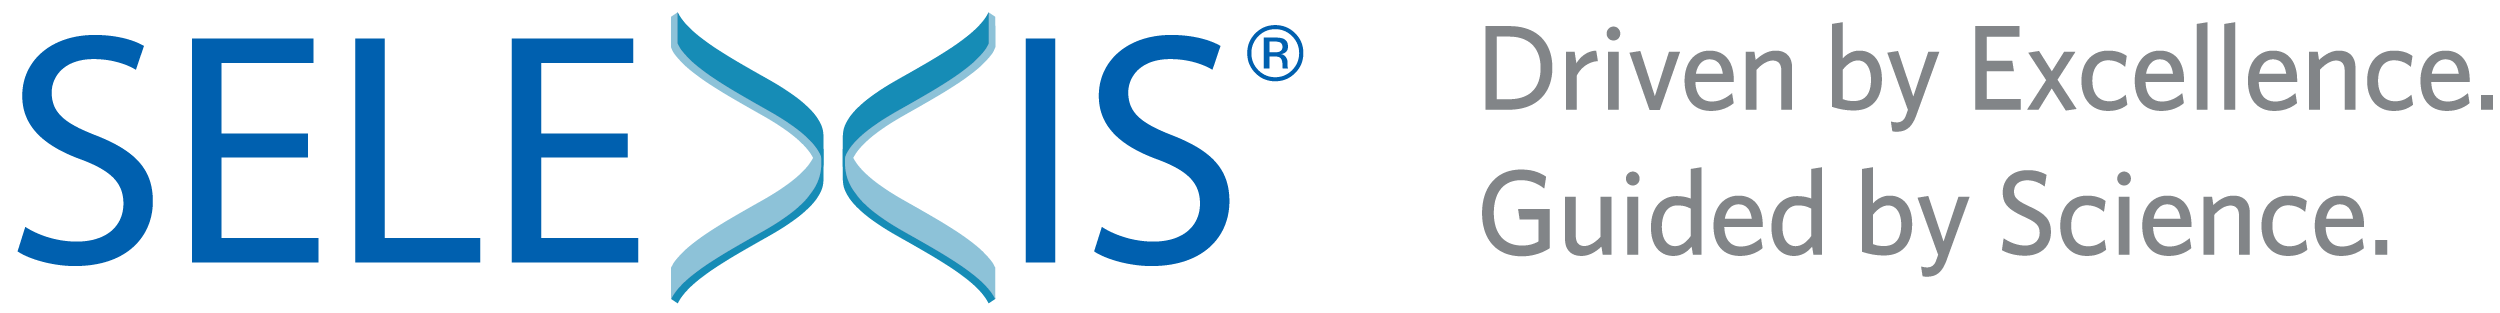 SELEXIS-logo-with-tagline-2016MAR19-V600-Full-Color